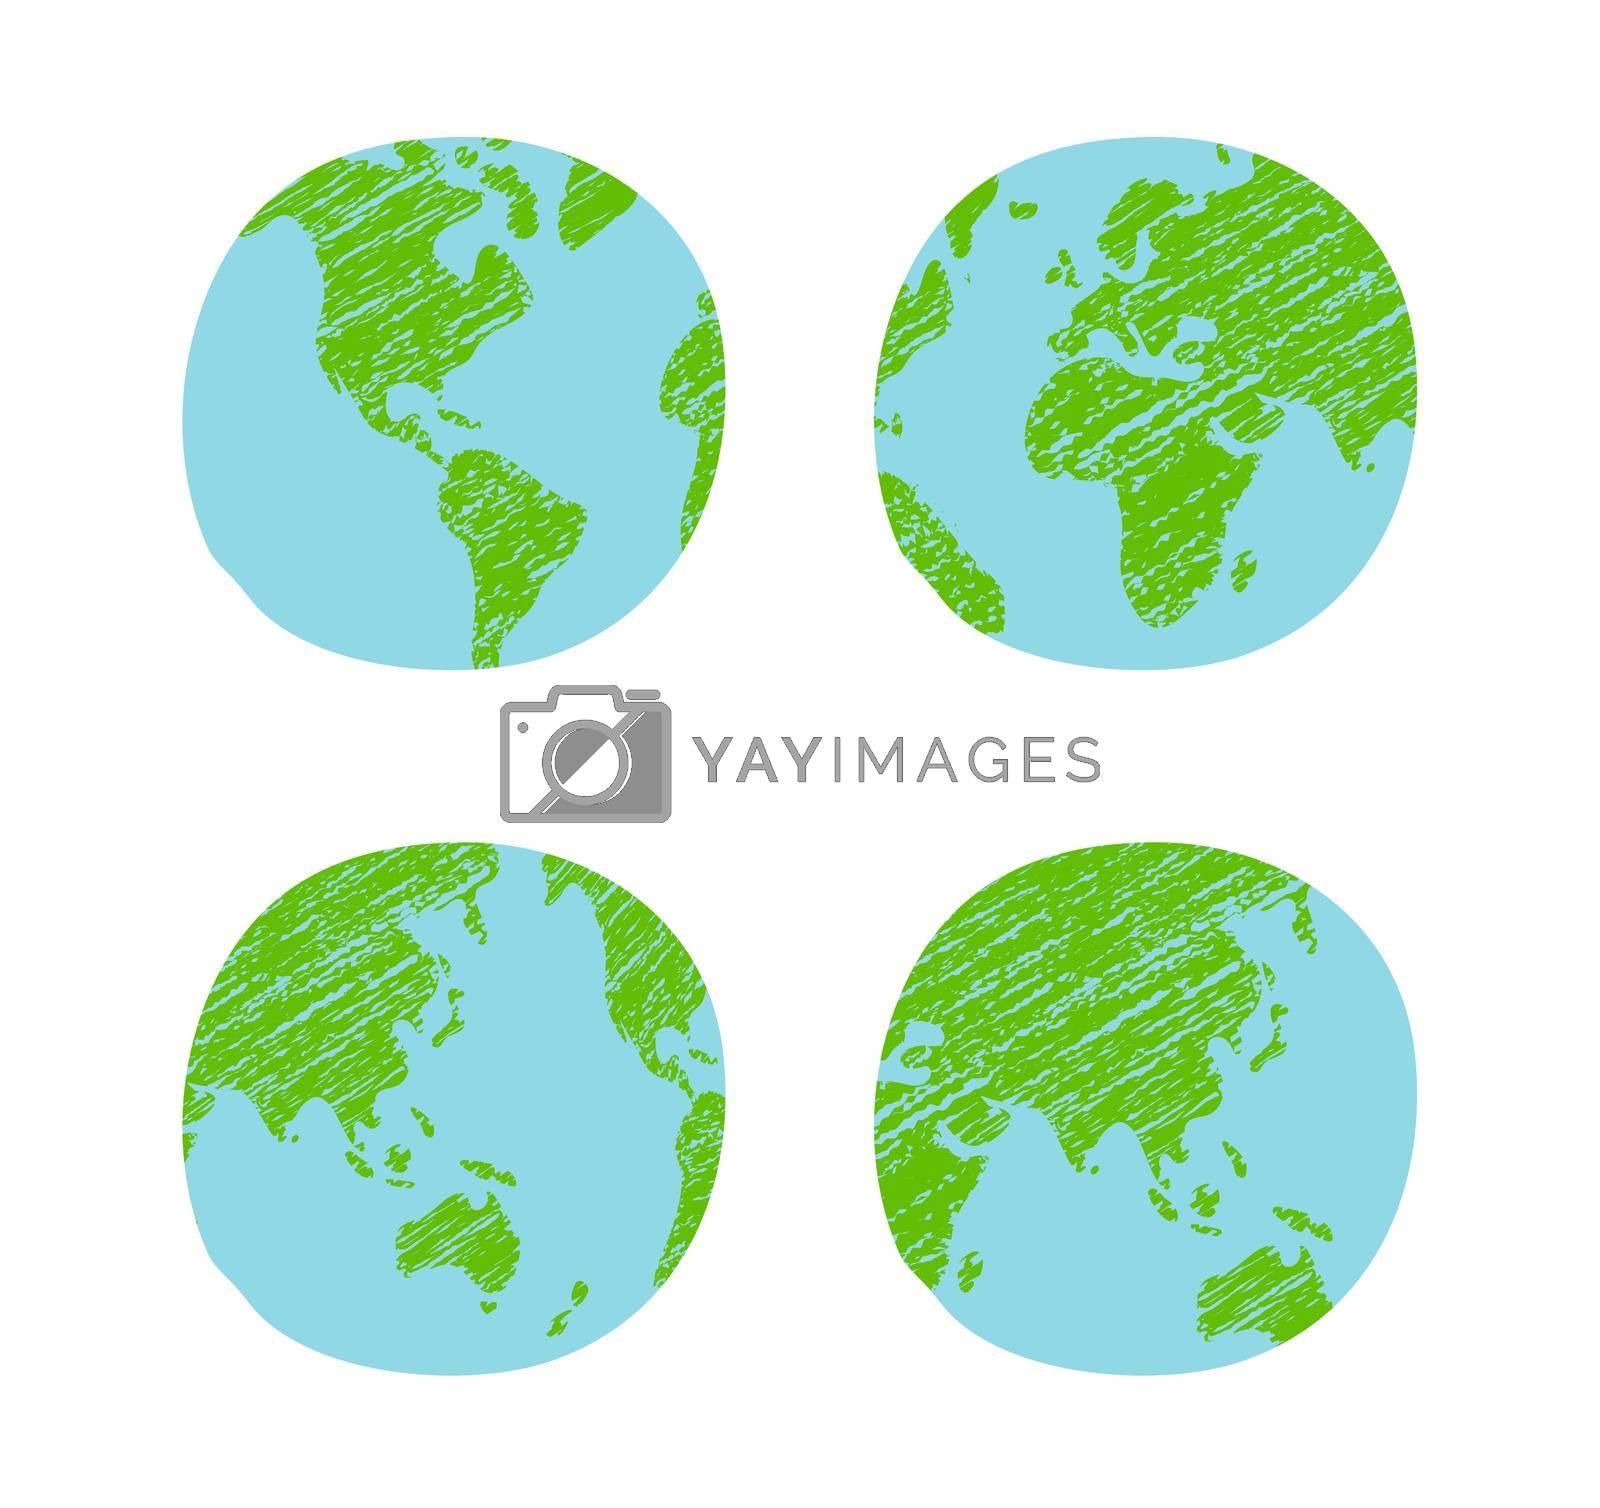 Chalked vector grunge earth (world map, globe)  illustration set